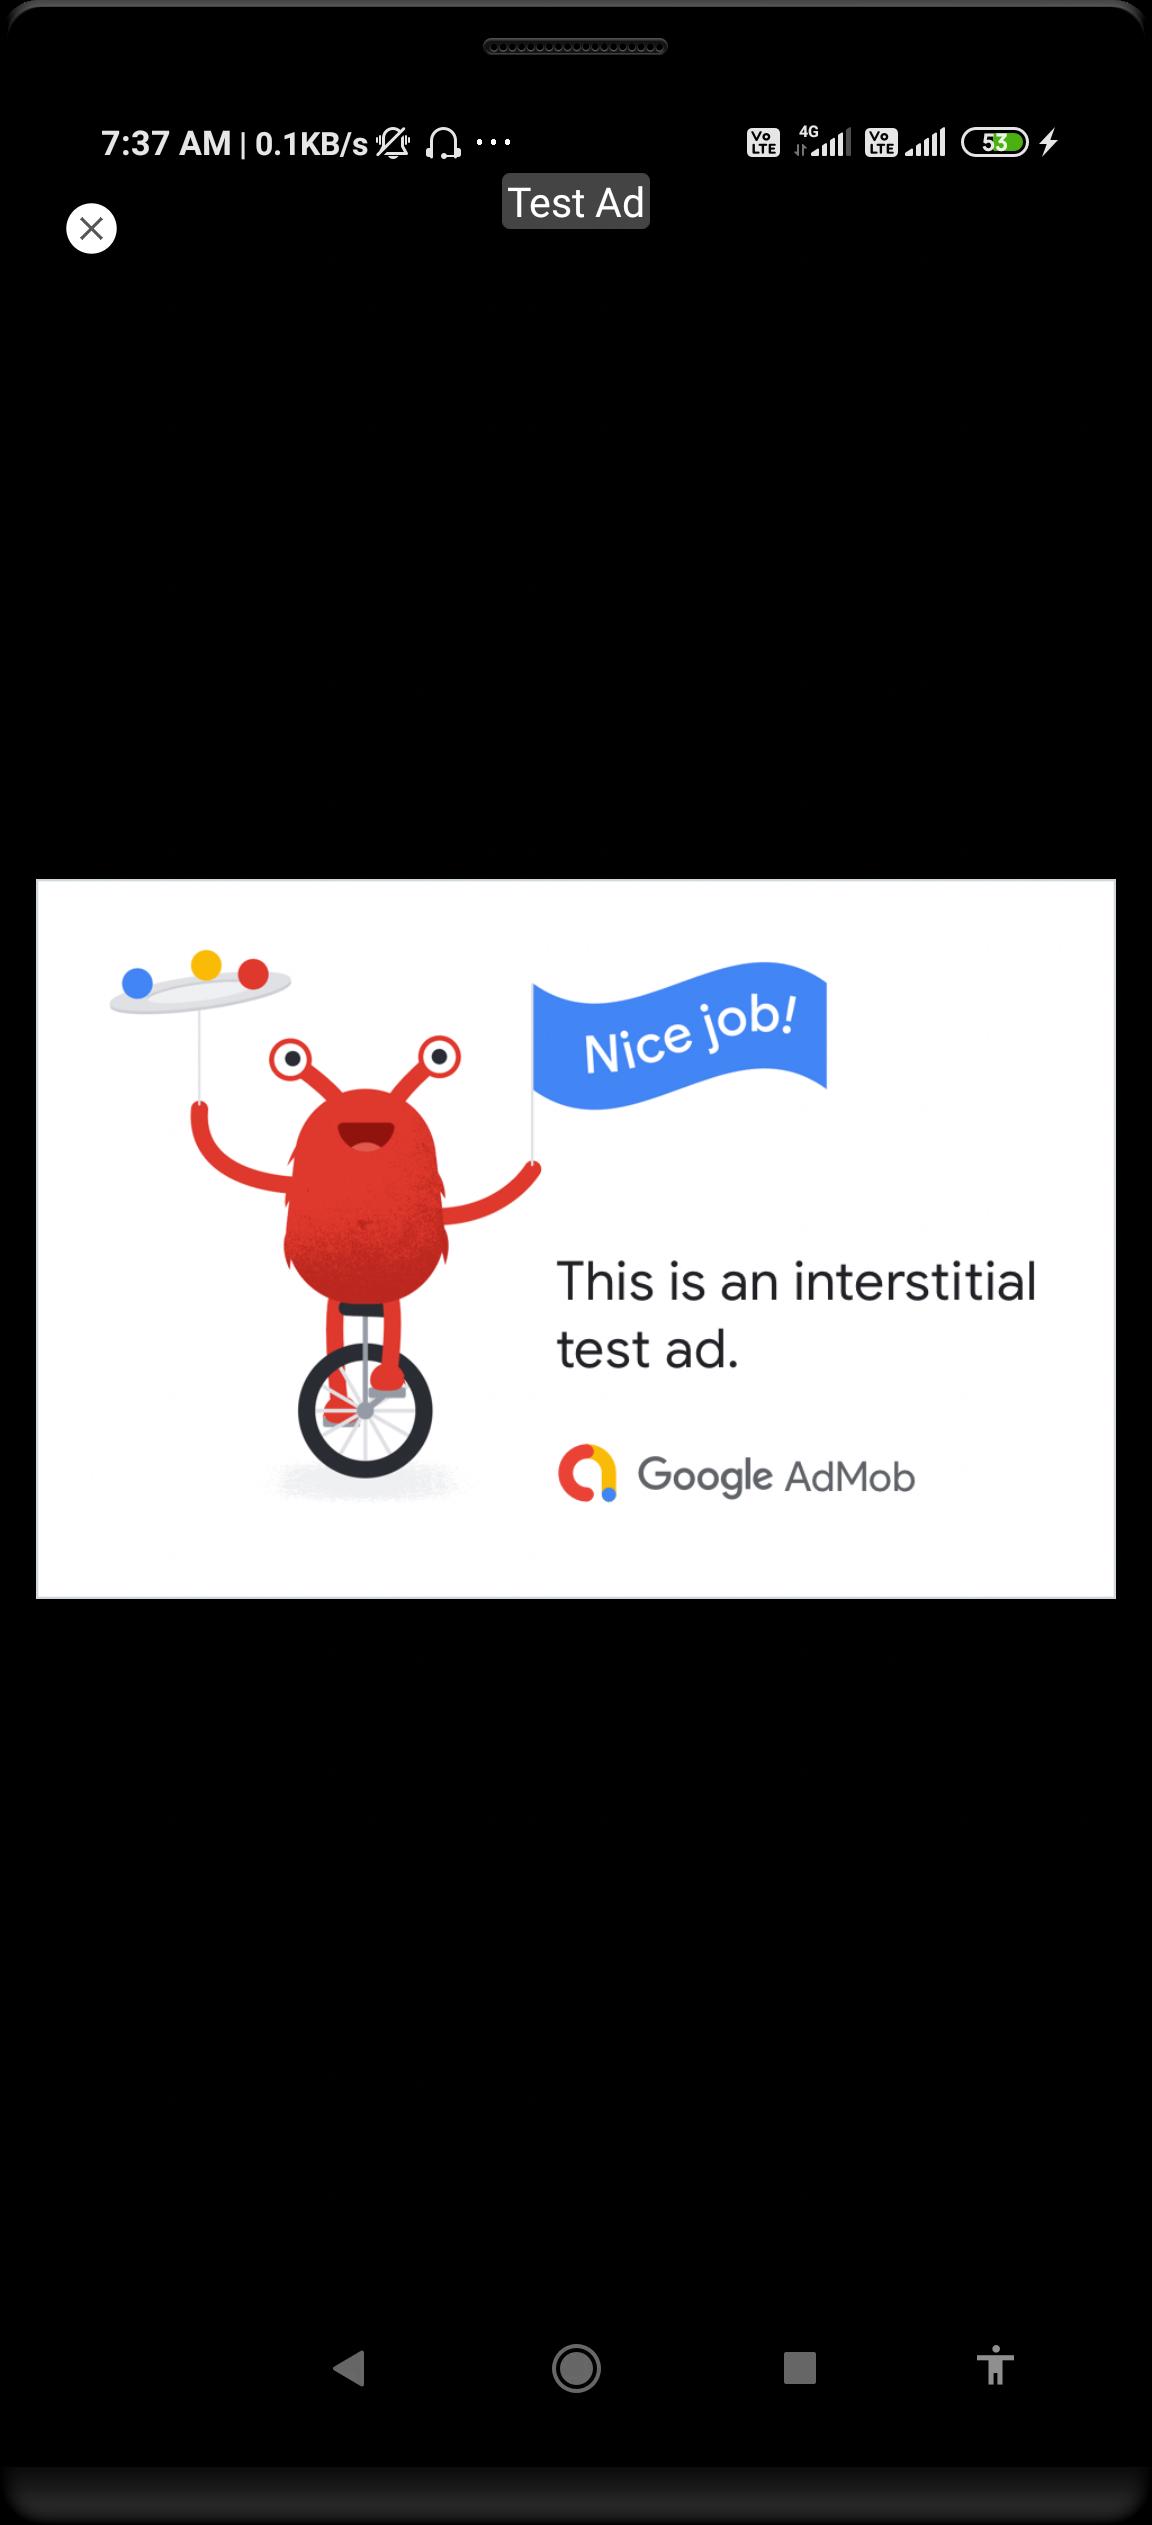 Admob Interstitial